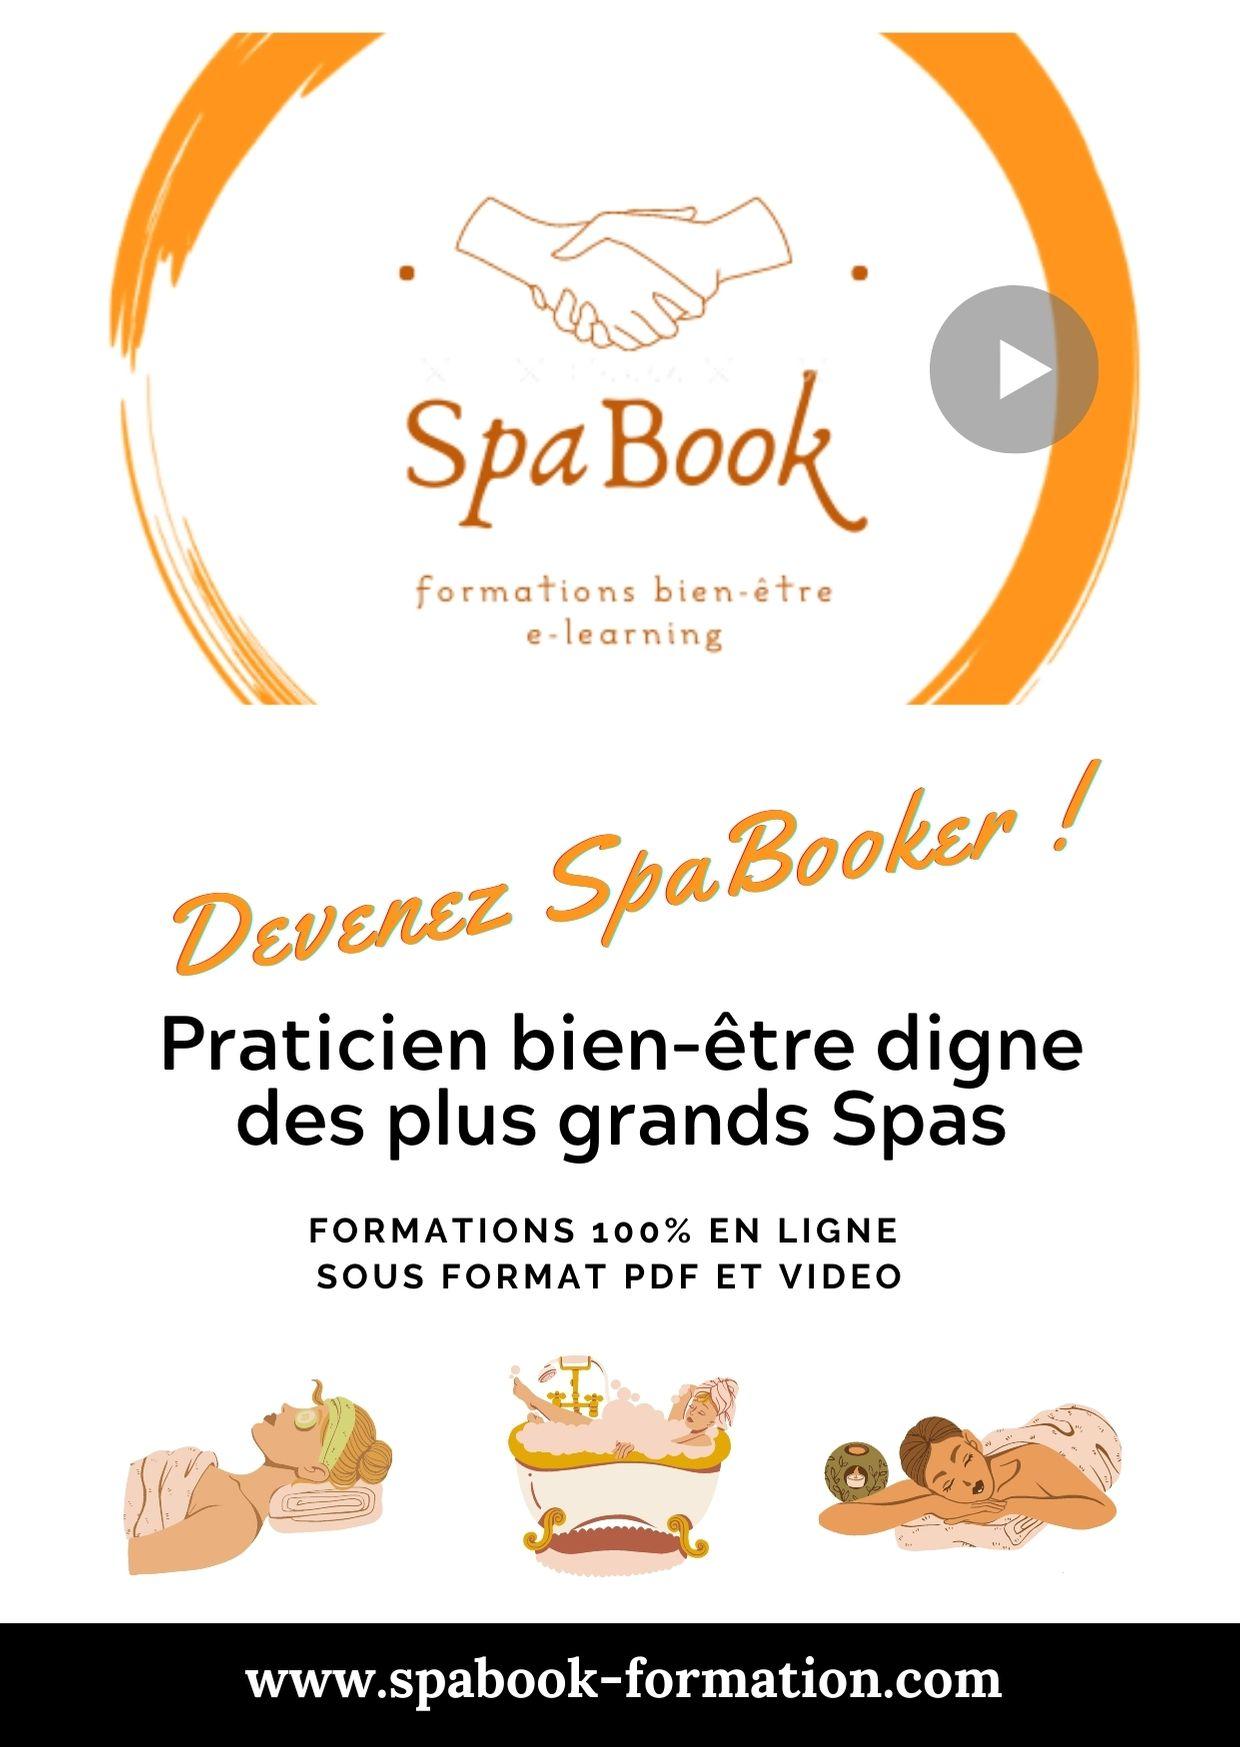 SpaBook